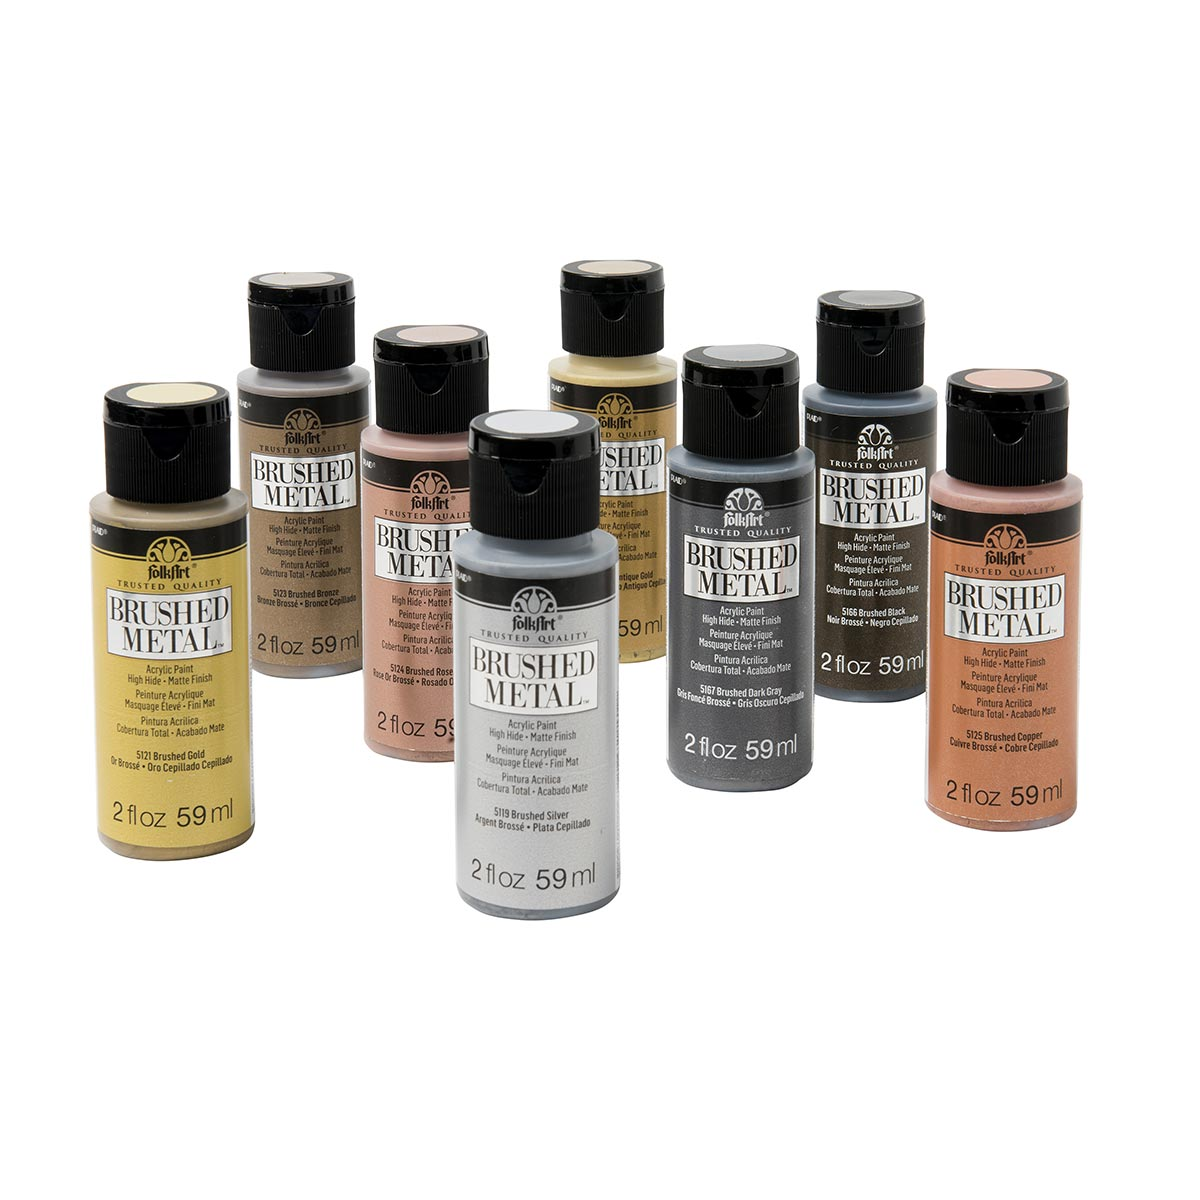 FolkArt ® Brushed Metal™ Acrylic Paint Set 8 Color - PROMOBM8